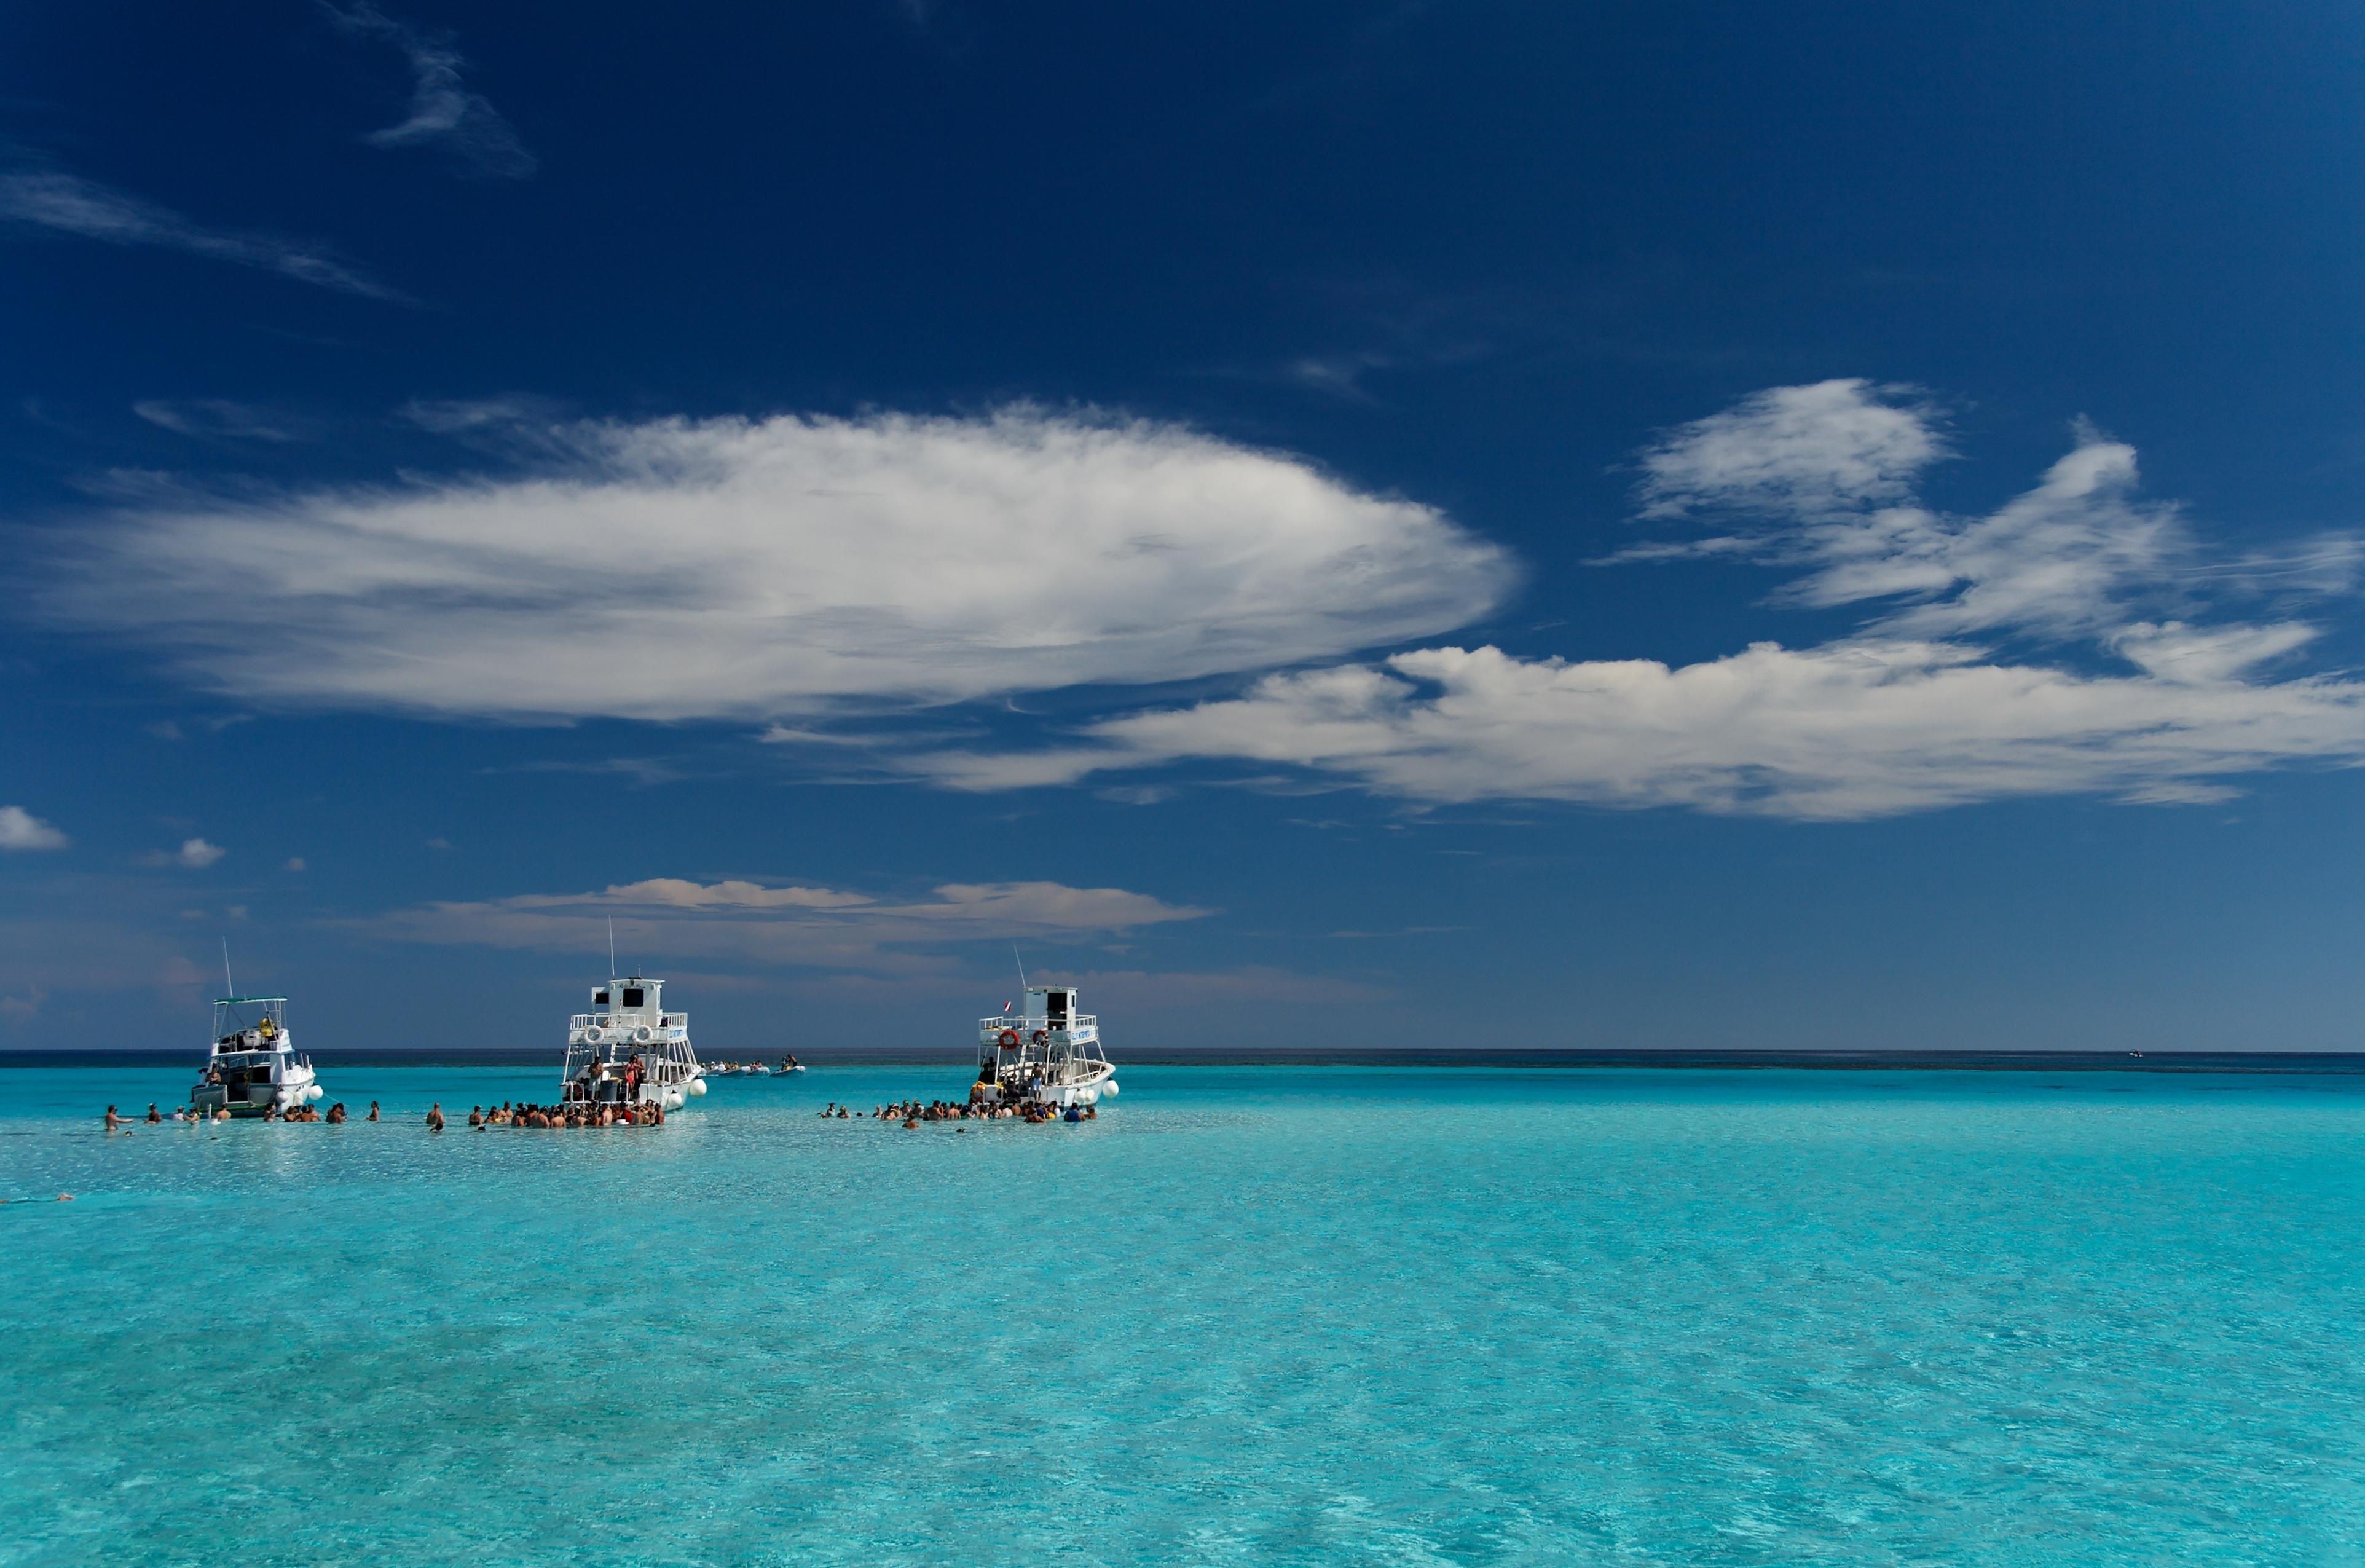 Enjoy a boat trip in the Cayman Islands